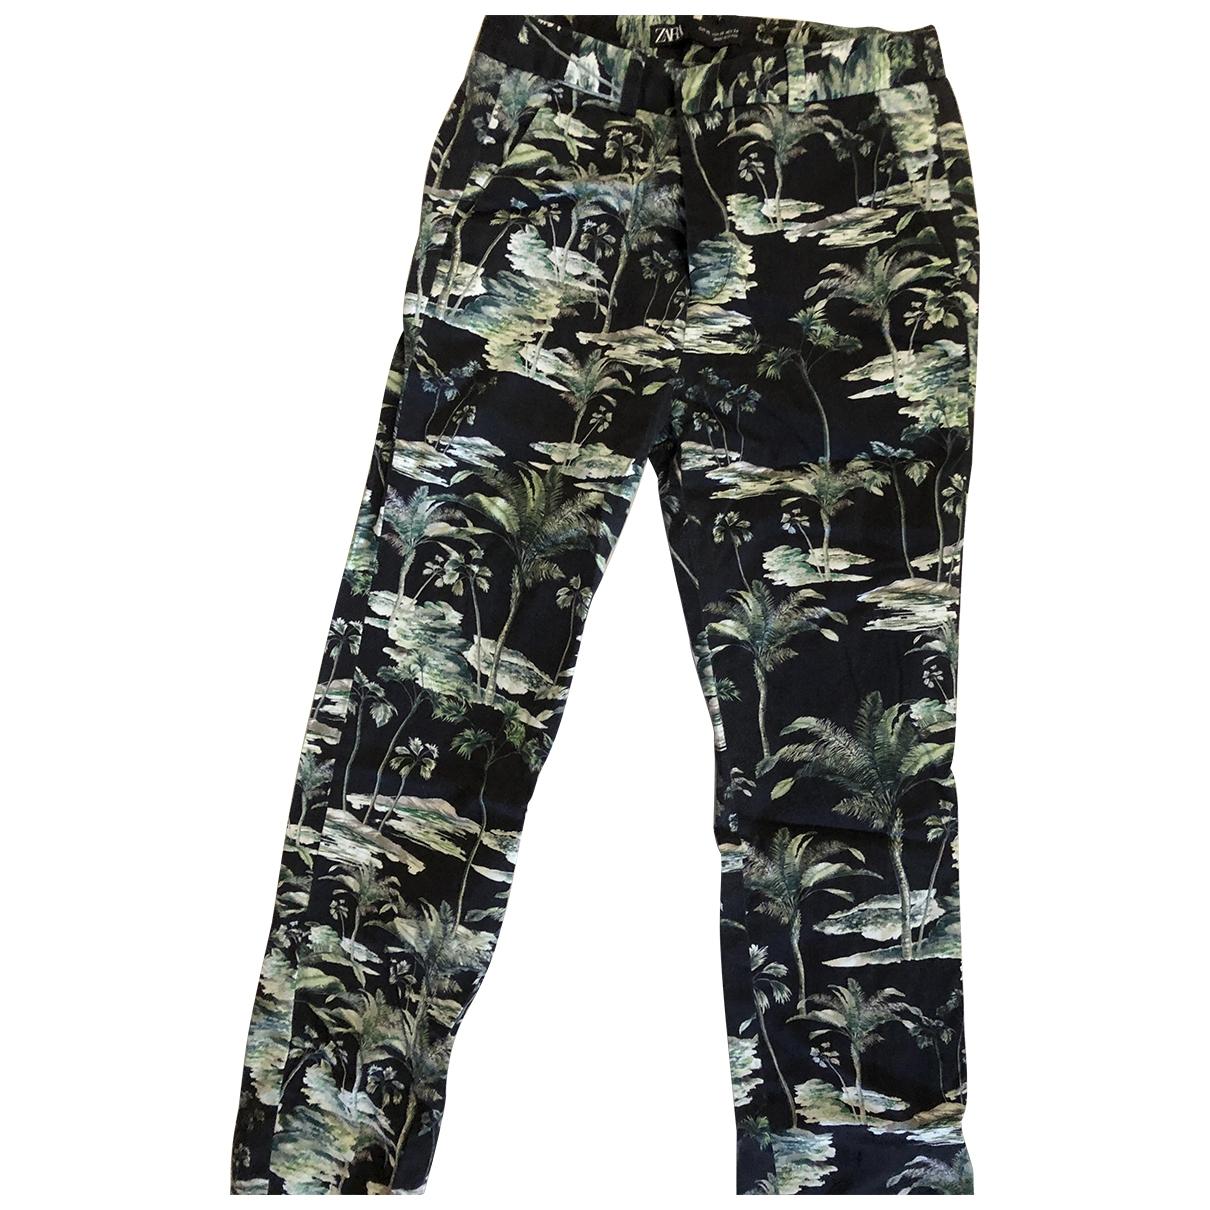 Zara \N Black Cotton Trousers for Women 34 FR